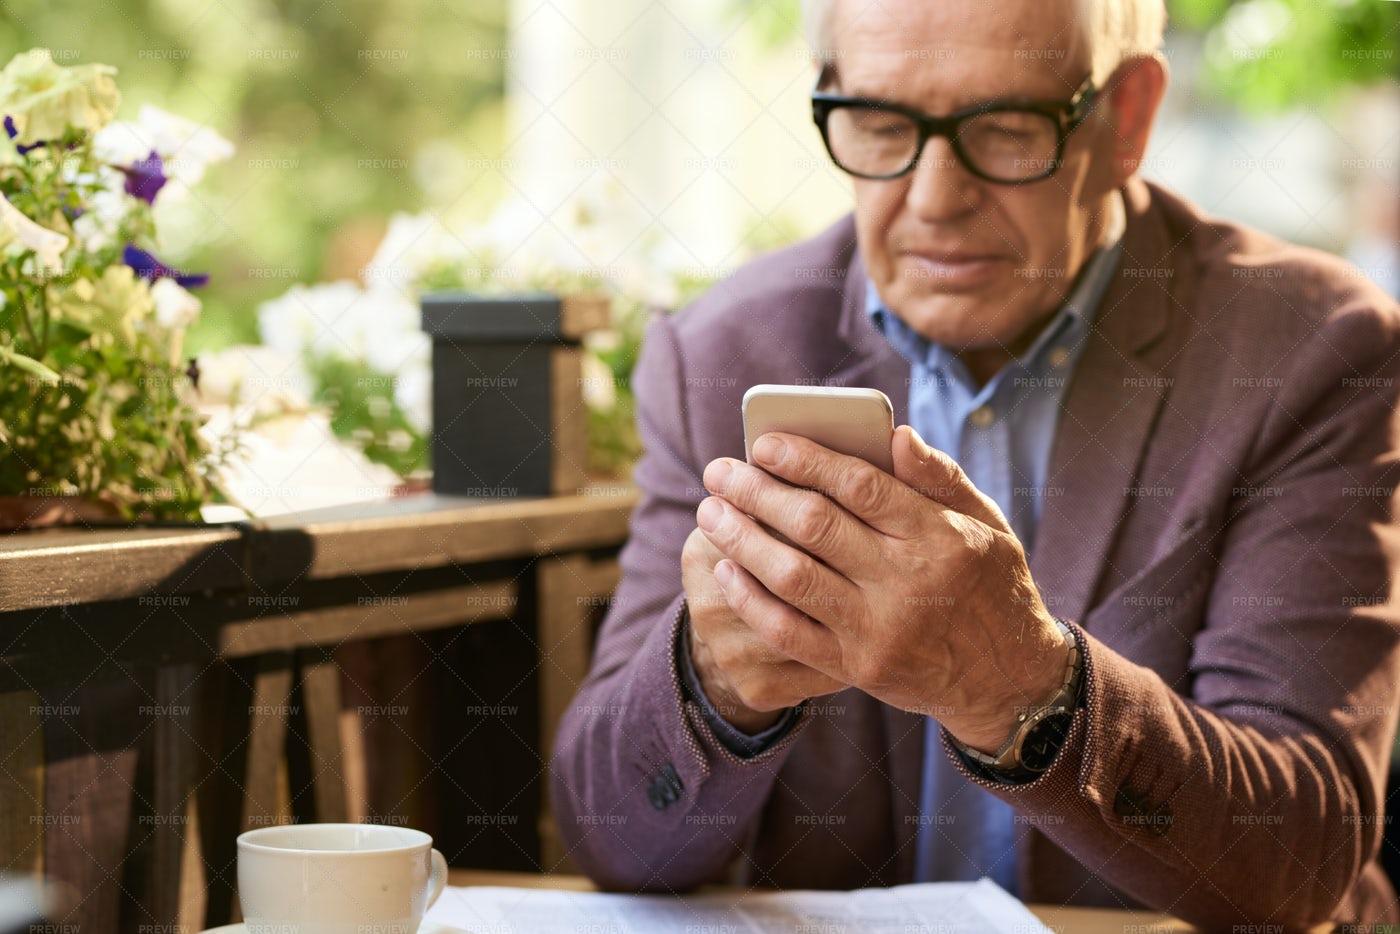 Senior Man Holding Smartphone In...: Stock Photos